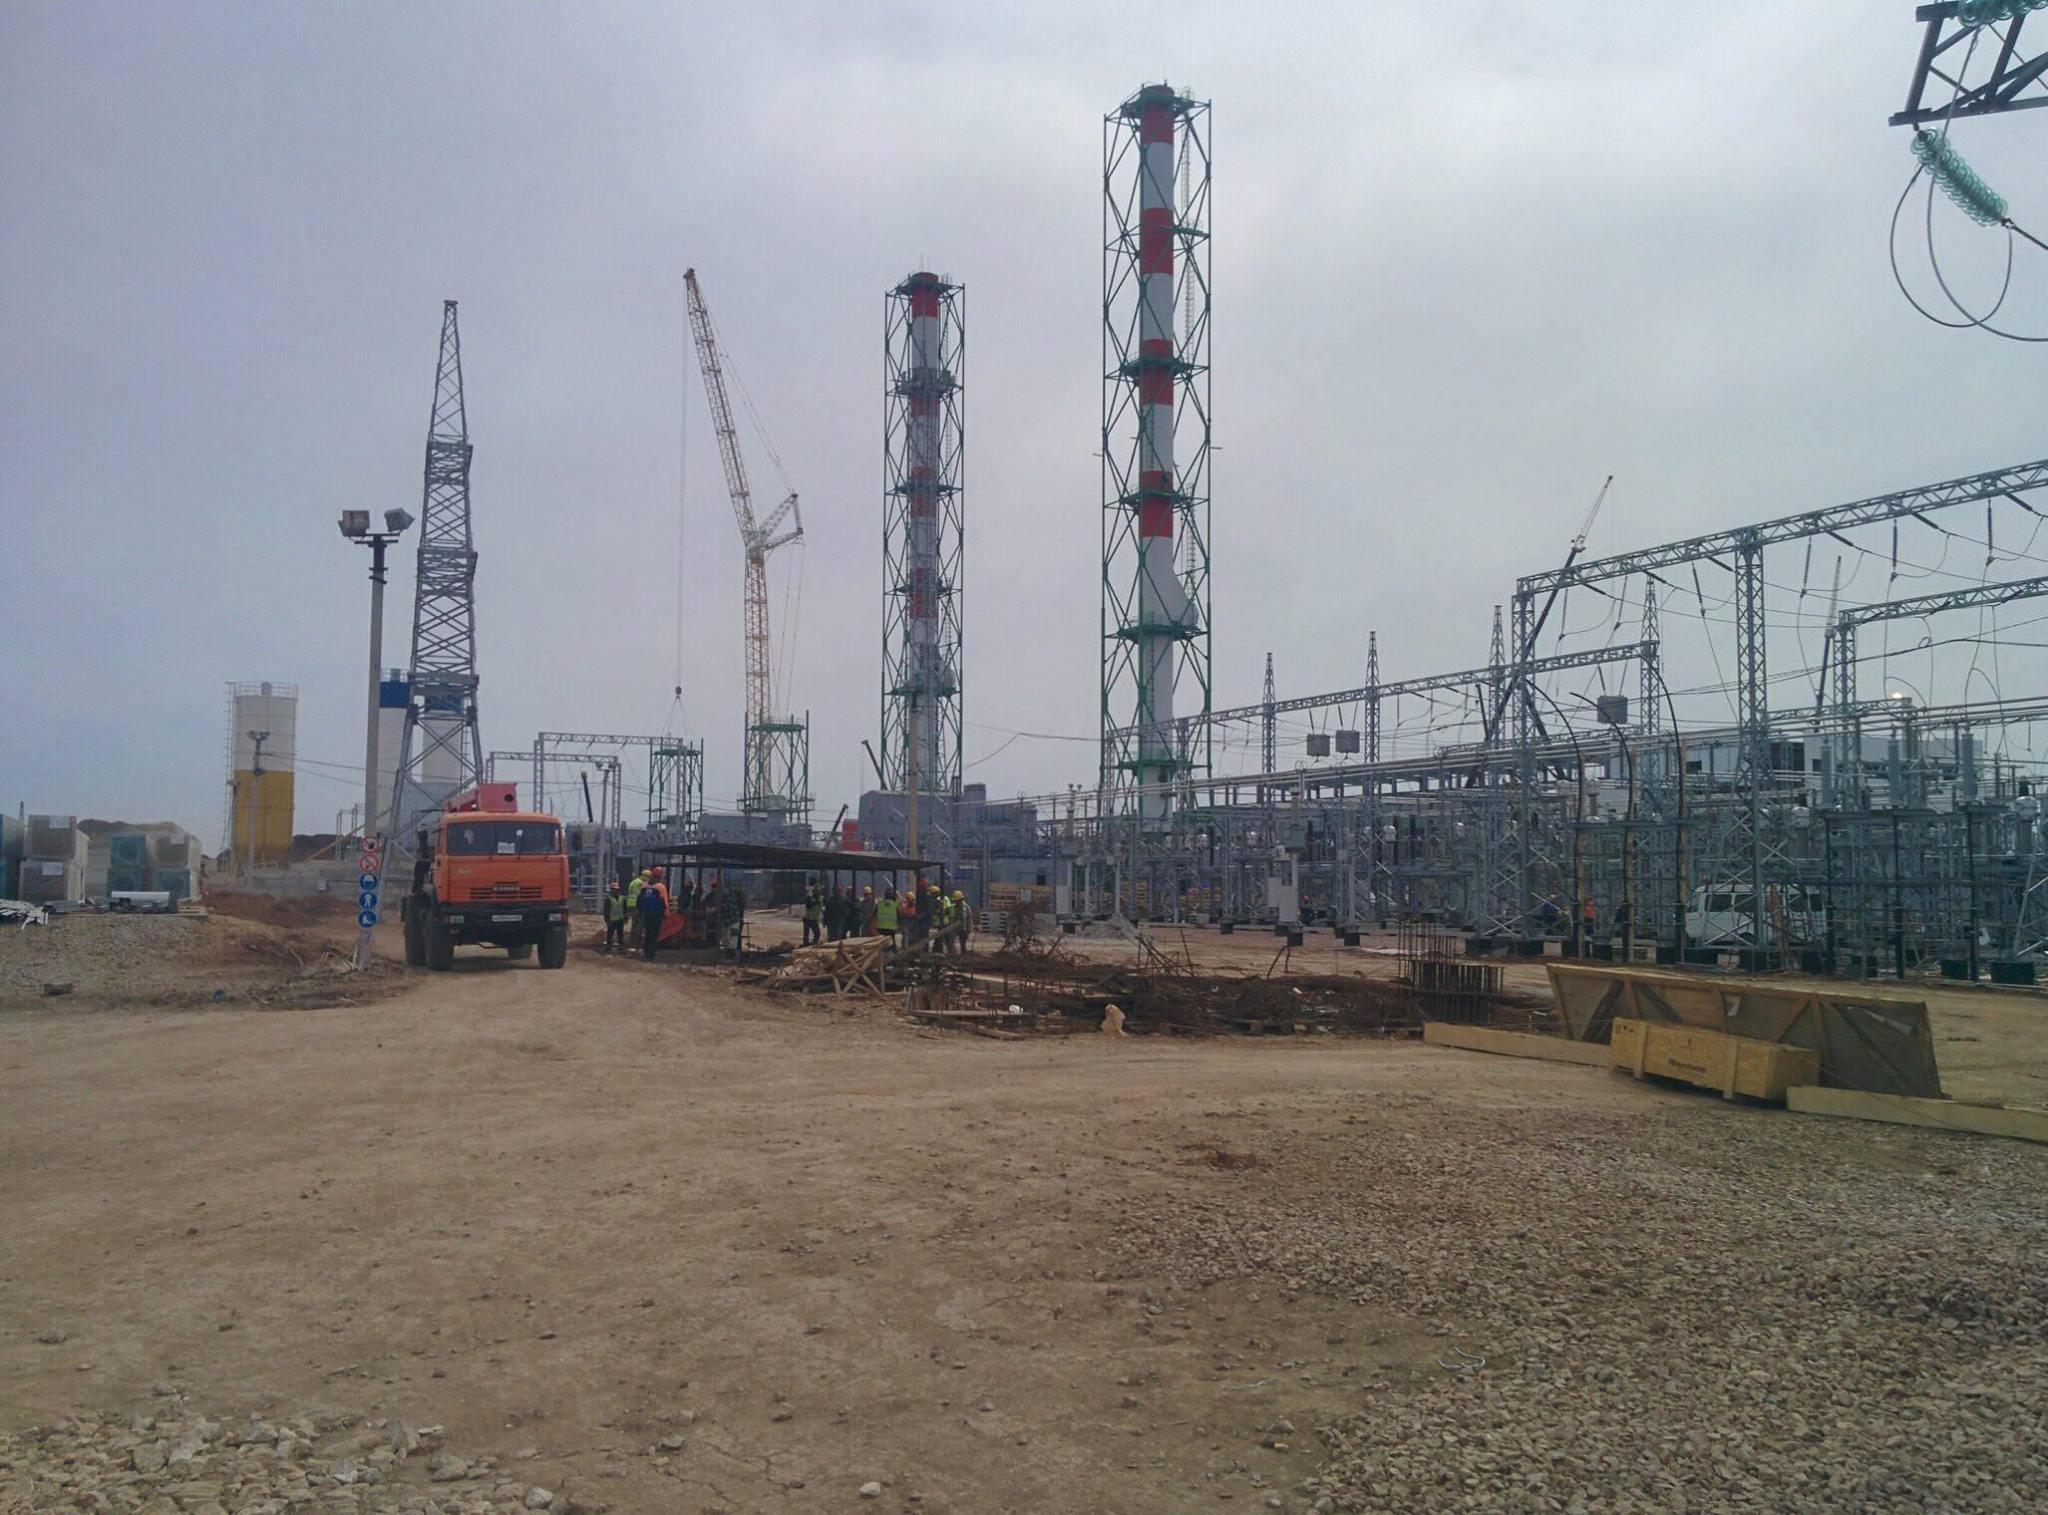 Строительство ТЭС в Саках практически завершено